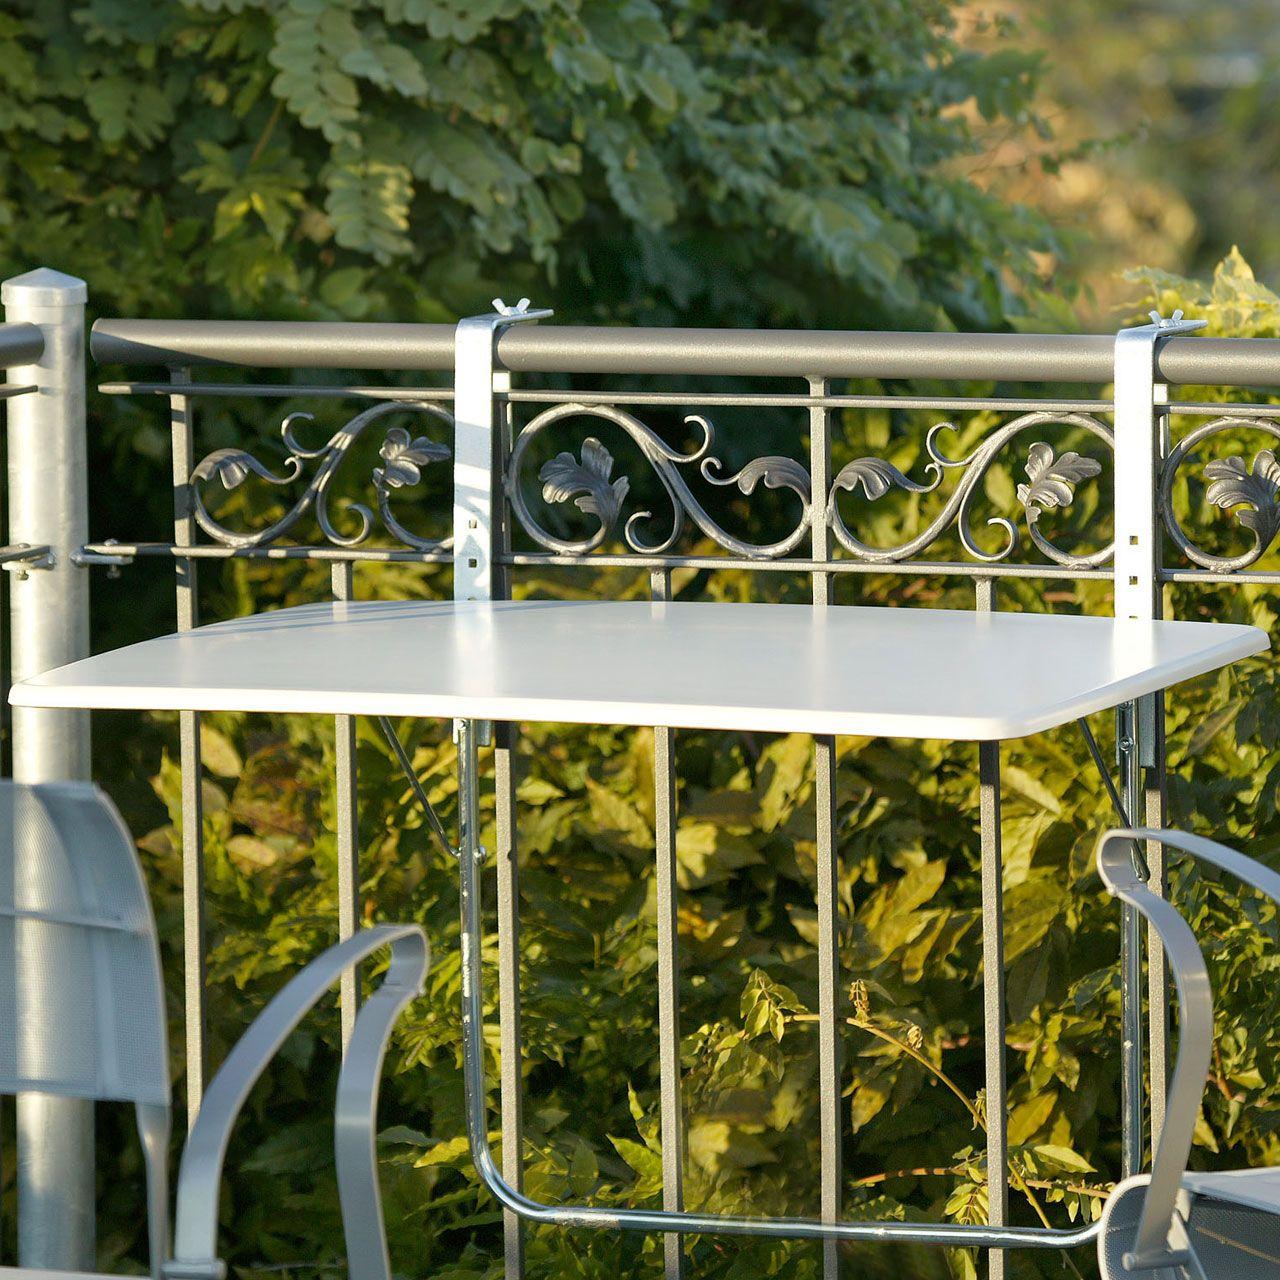 Balkonklapptisch Werzalitplatte Weiss 60 X 80cm Outdoor